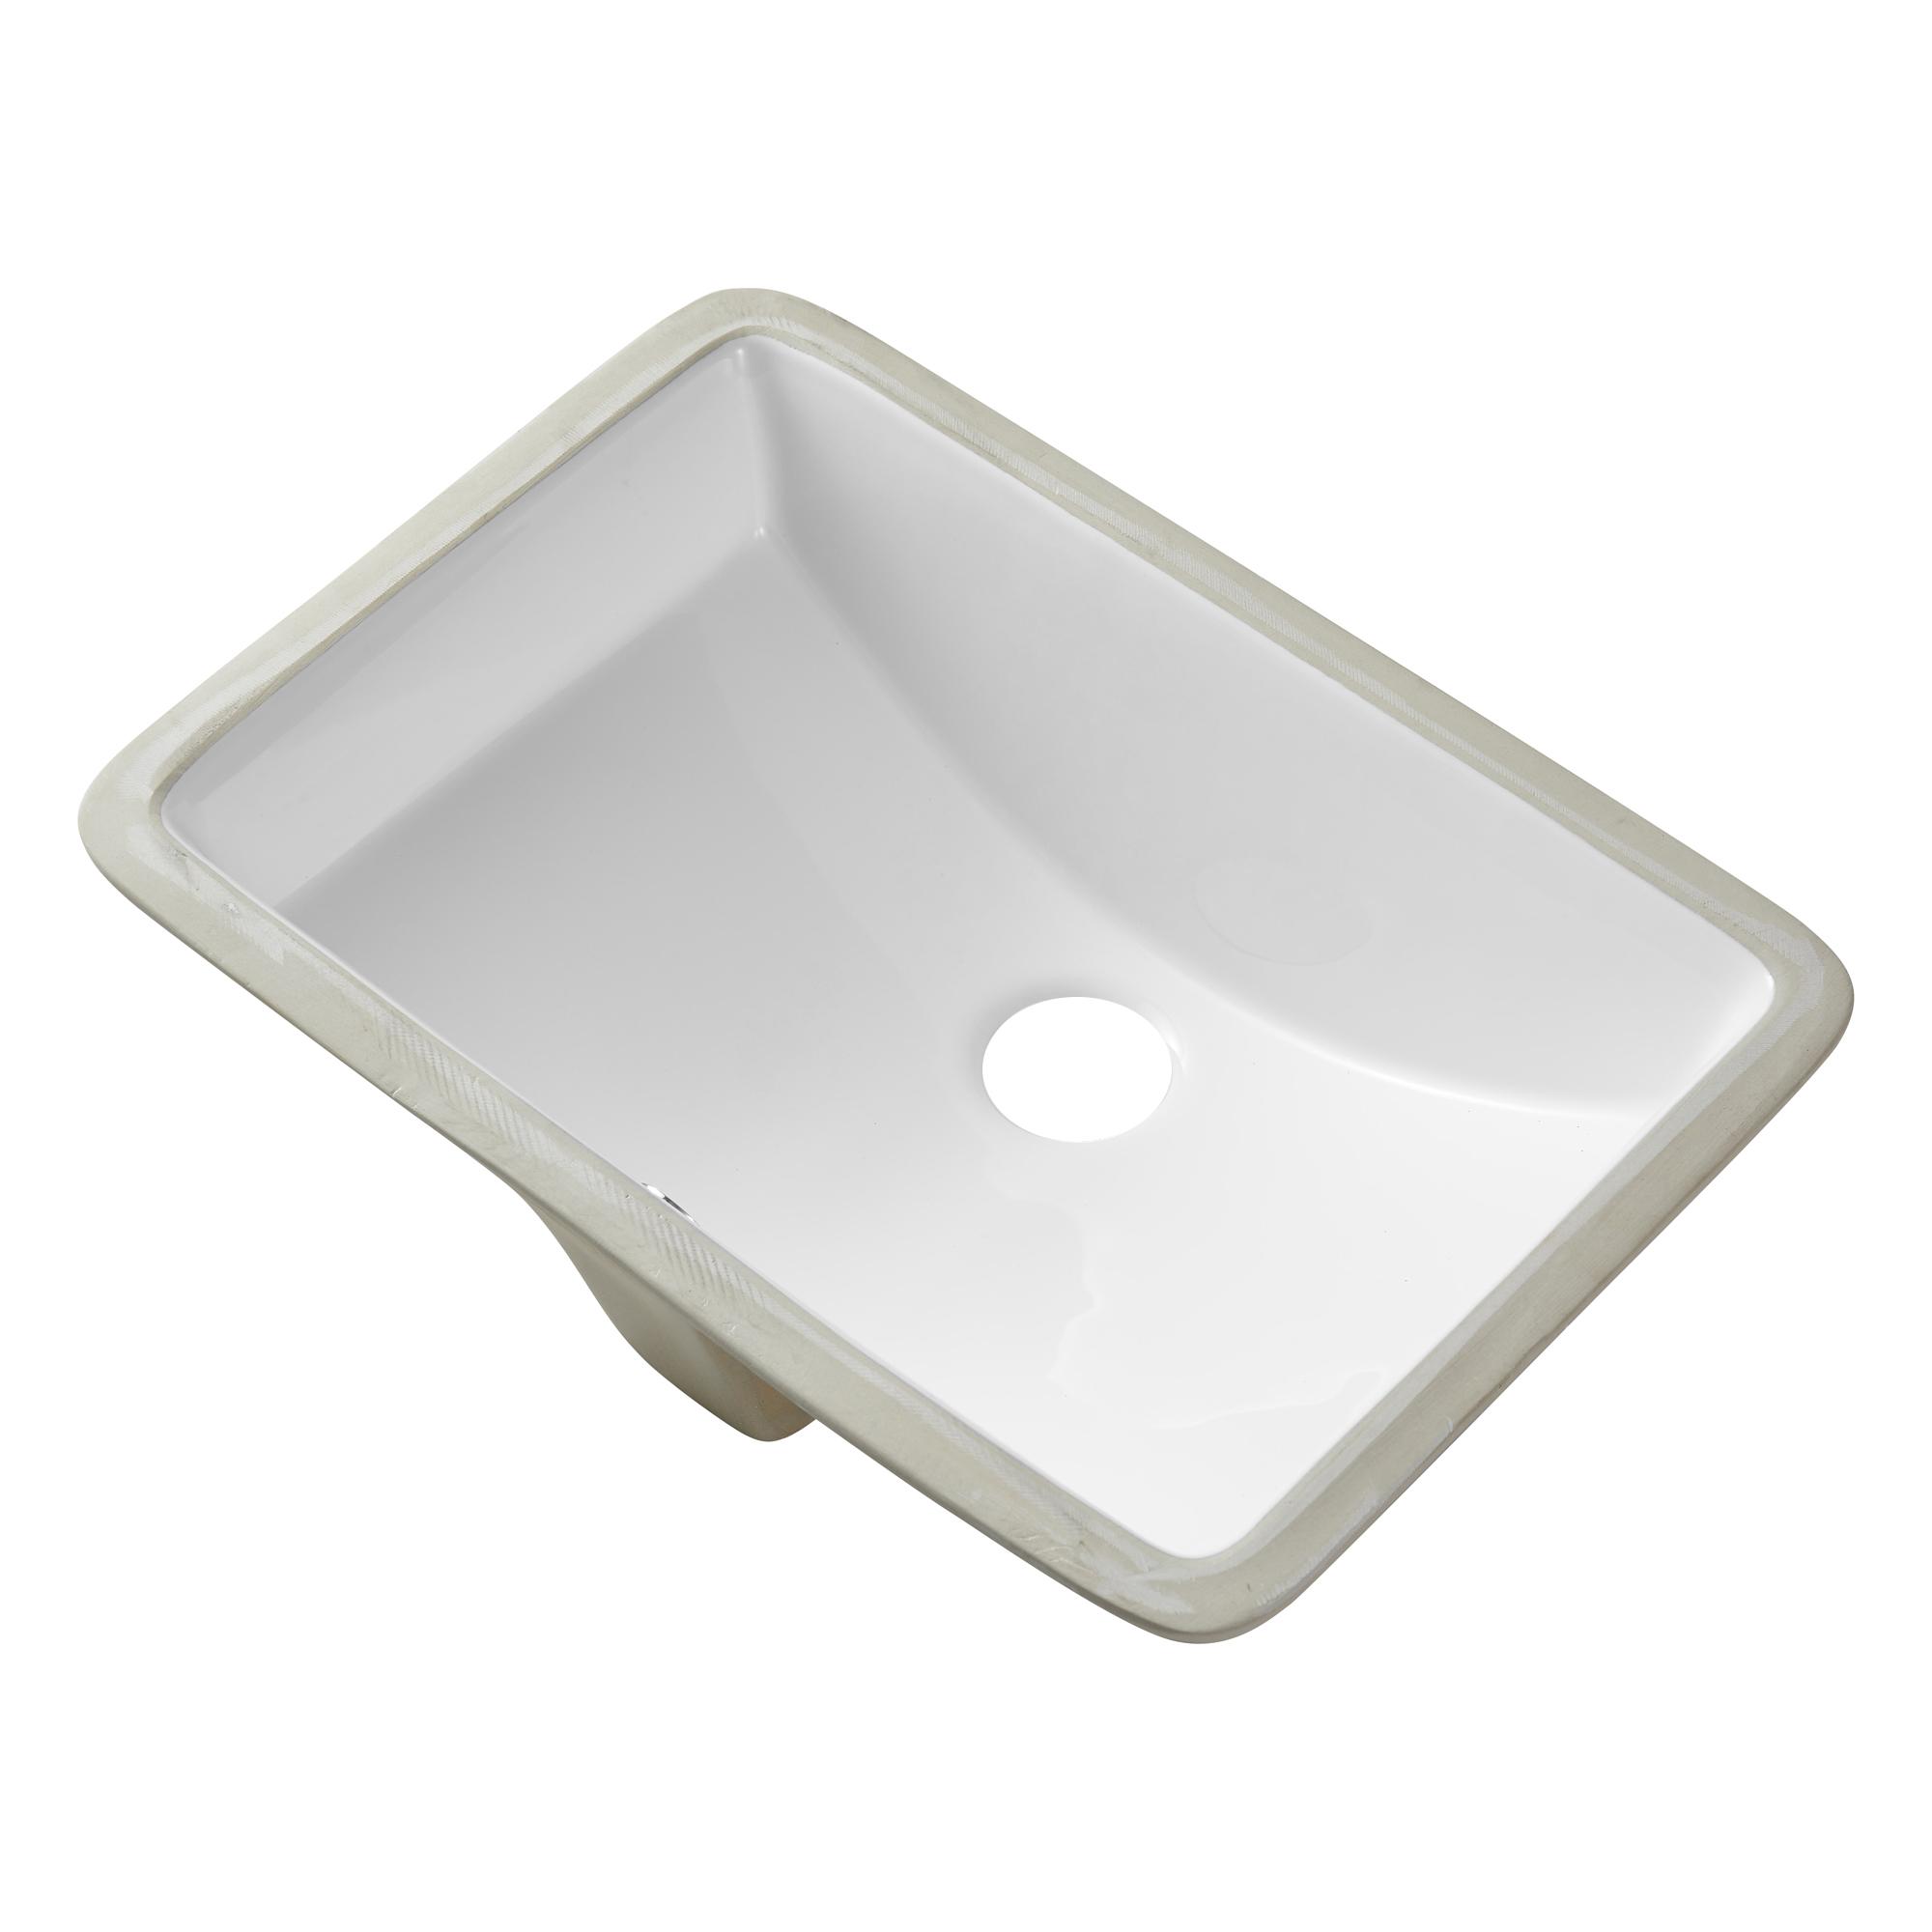 [US Direct] Ceramic Rectangular  Undermount White Bathroom  Sink Art Basin